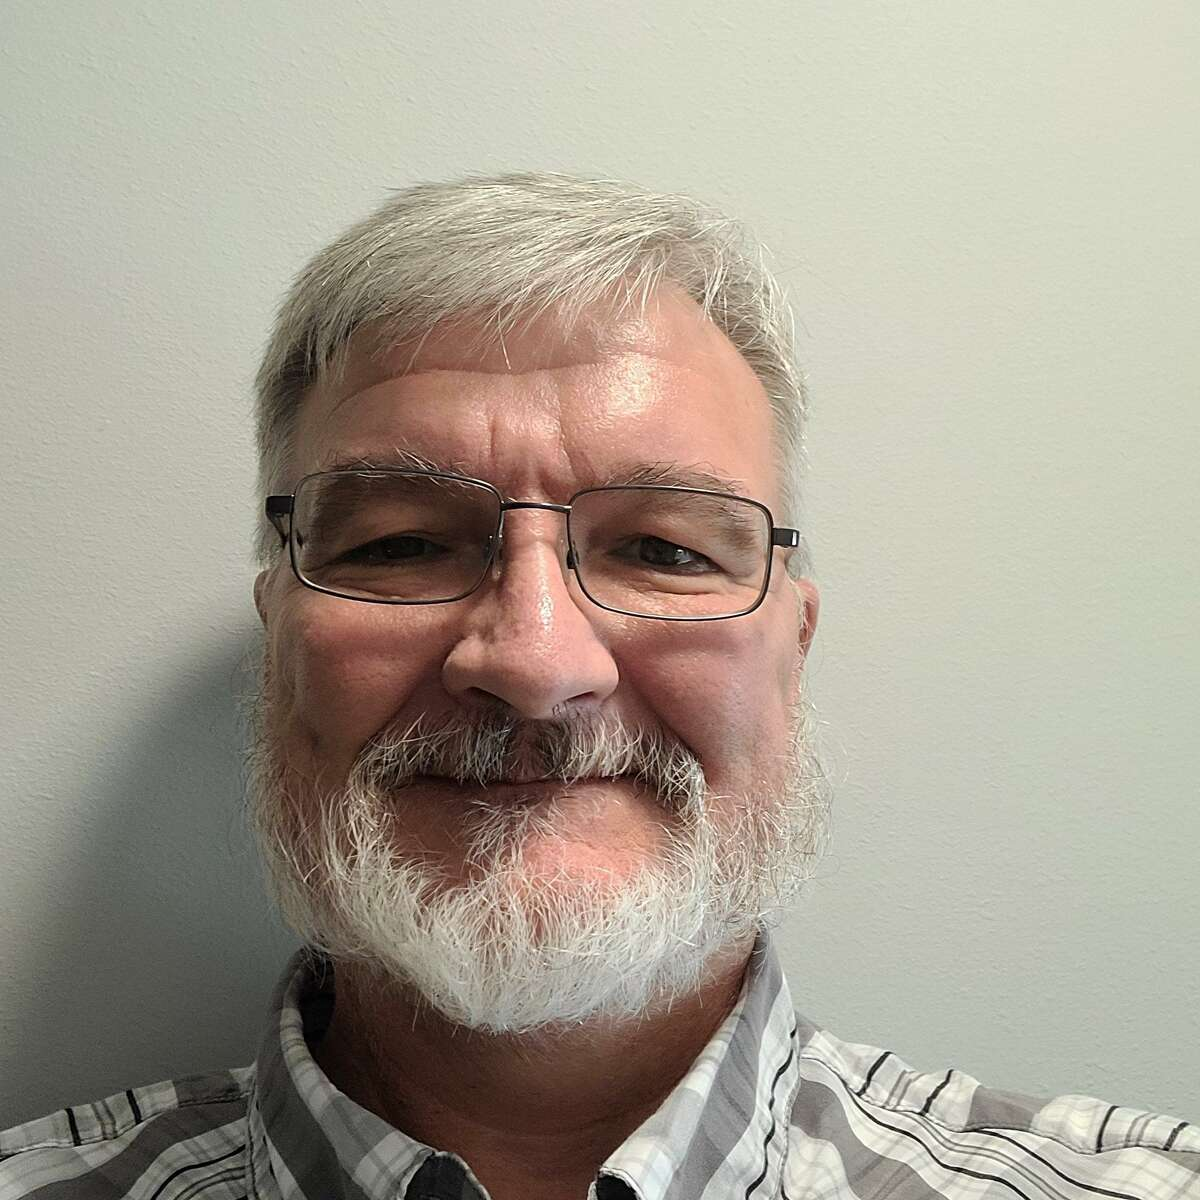 John Bowen has won a runoff election for League City council's Position 4 seat, defeating Rachel McAdam.